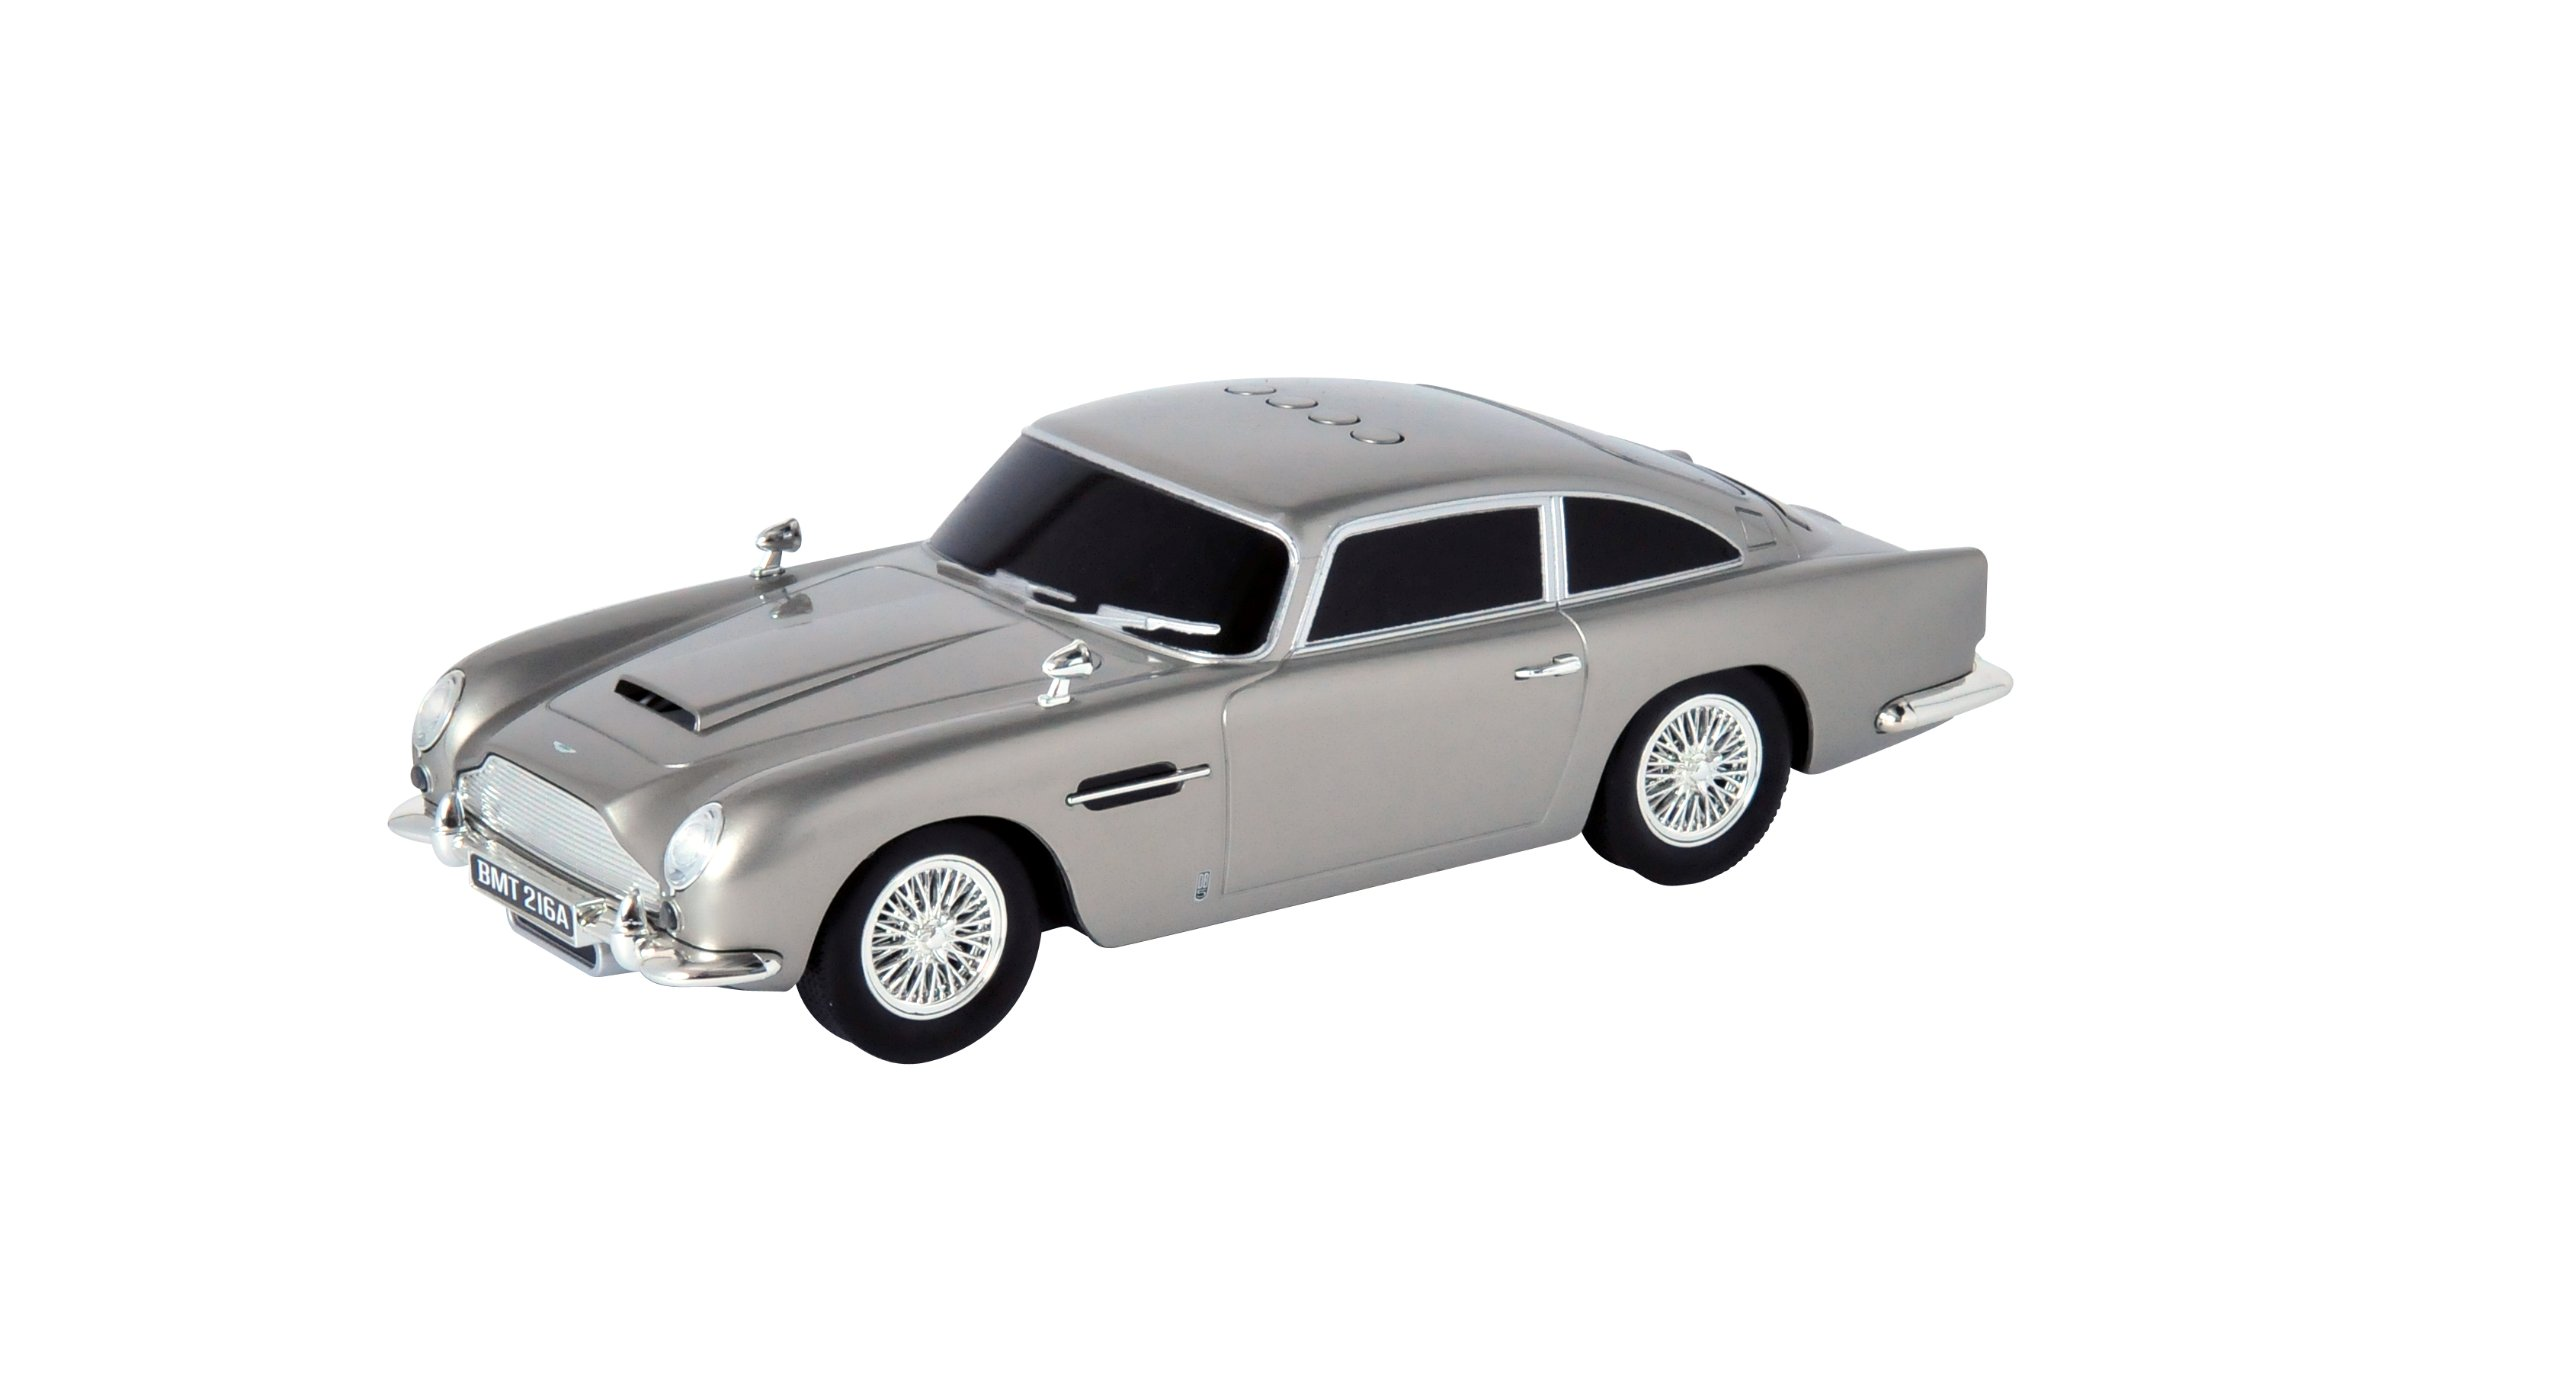 Toy State James Bond Light and Sound Street Agent Secret Agent: Bond Car (Skyfall)